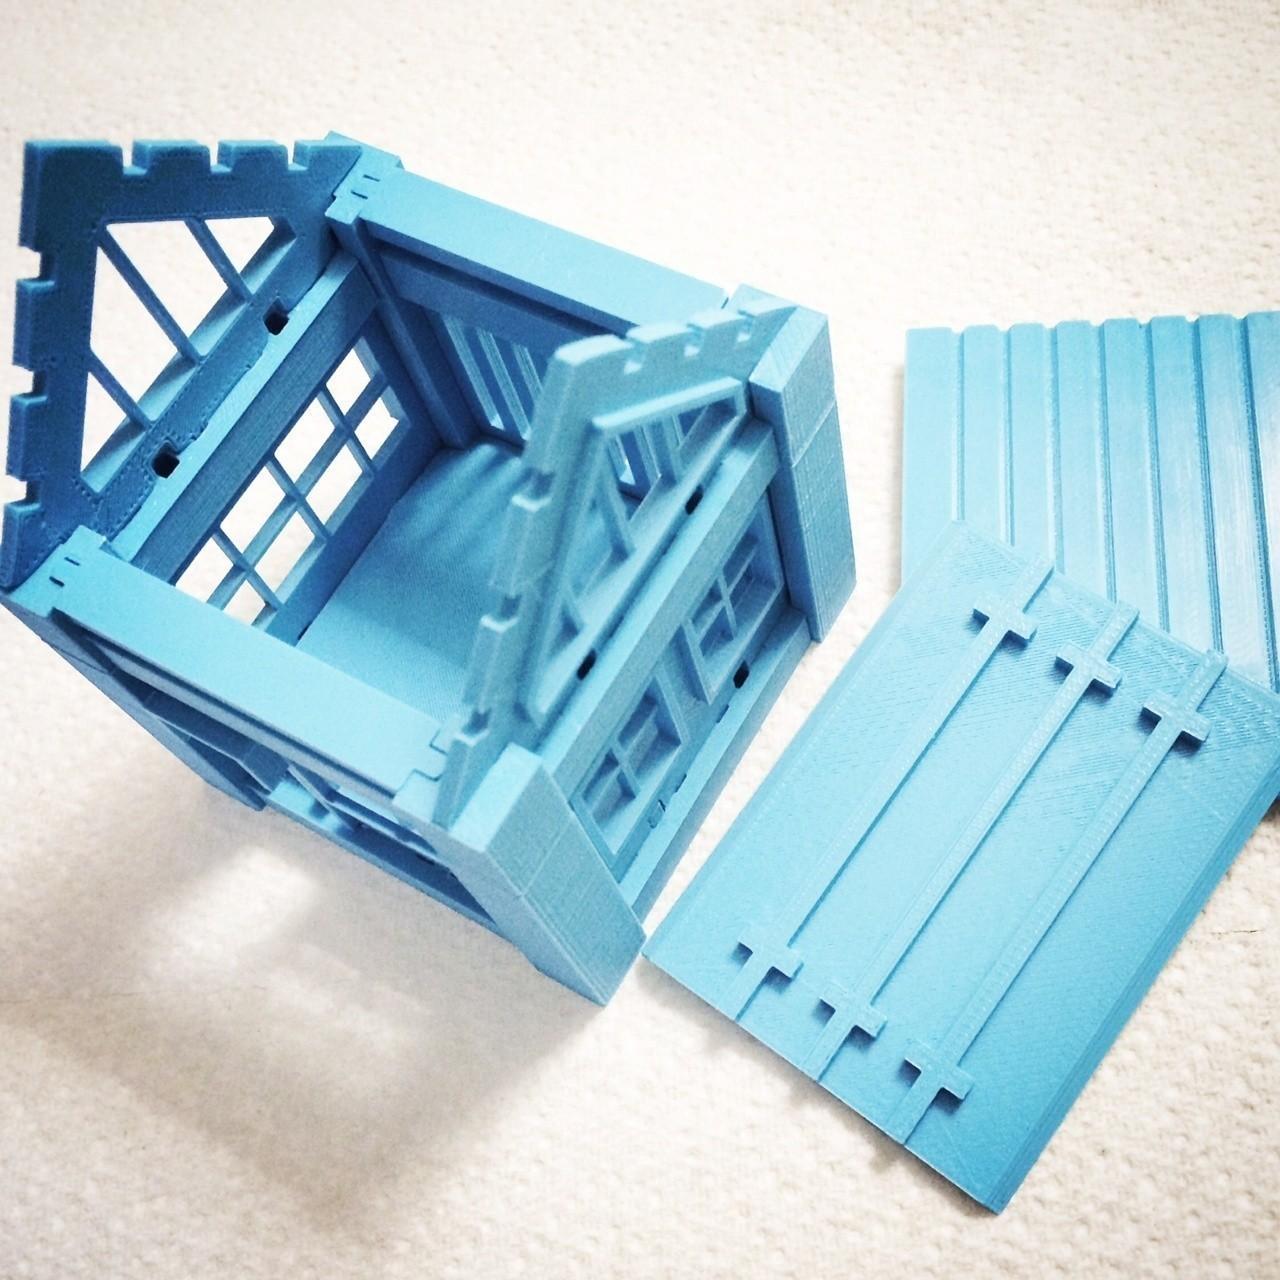 photo_1.jpg Download STL file Printable Architectural Kit 1 • 3D print design, ArchitectureKIT